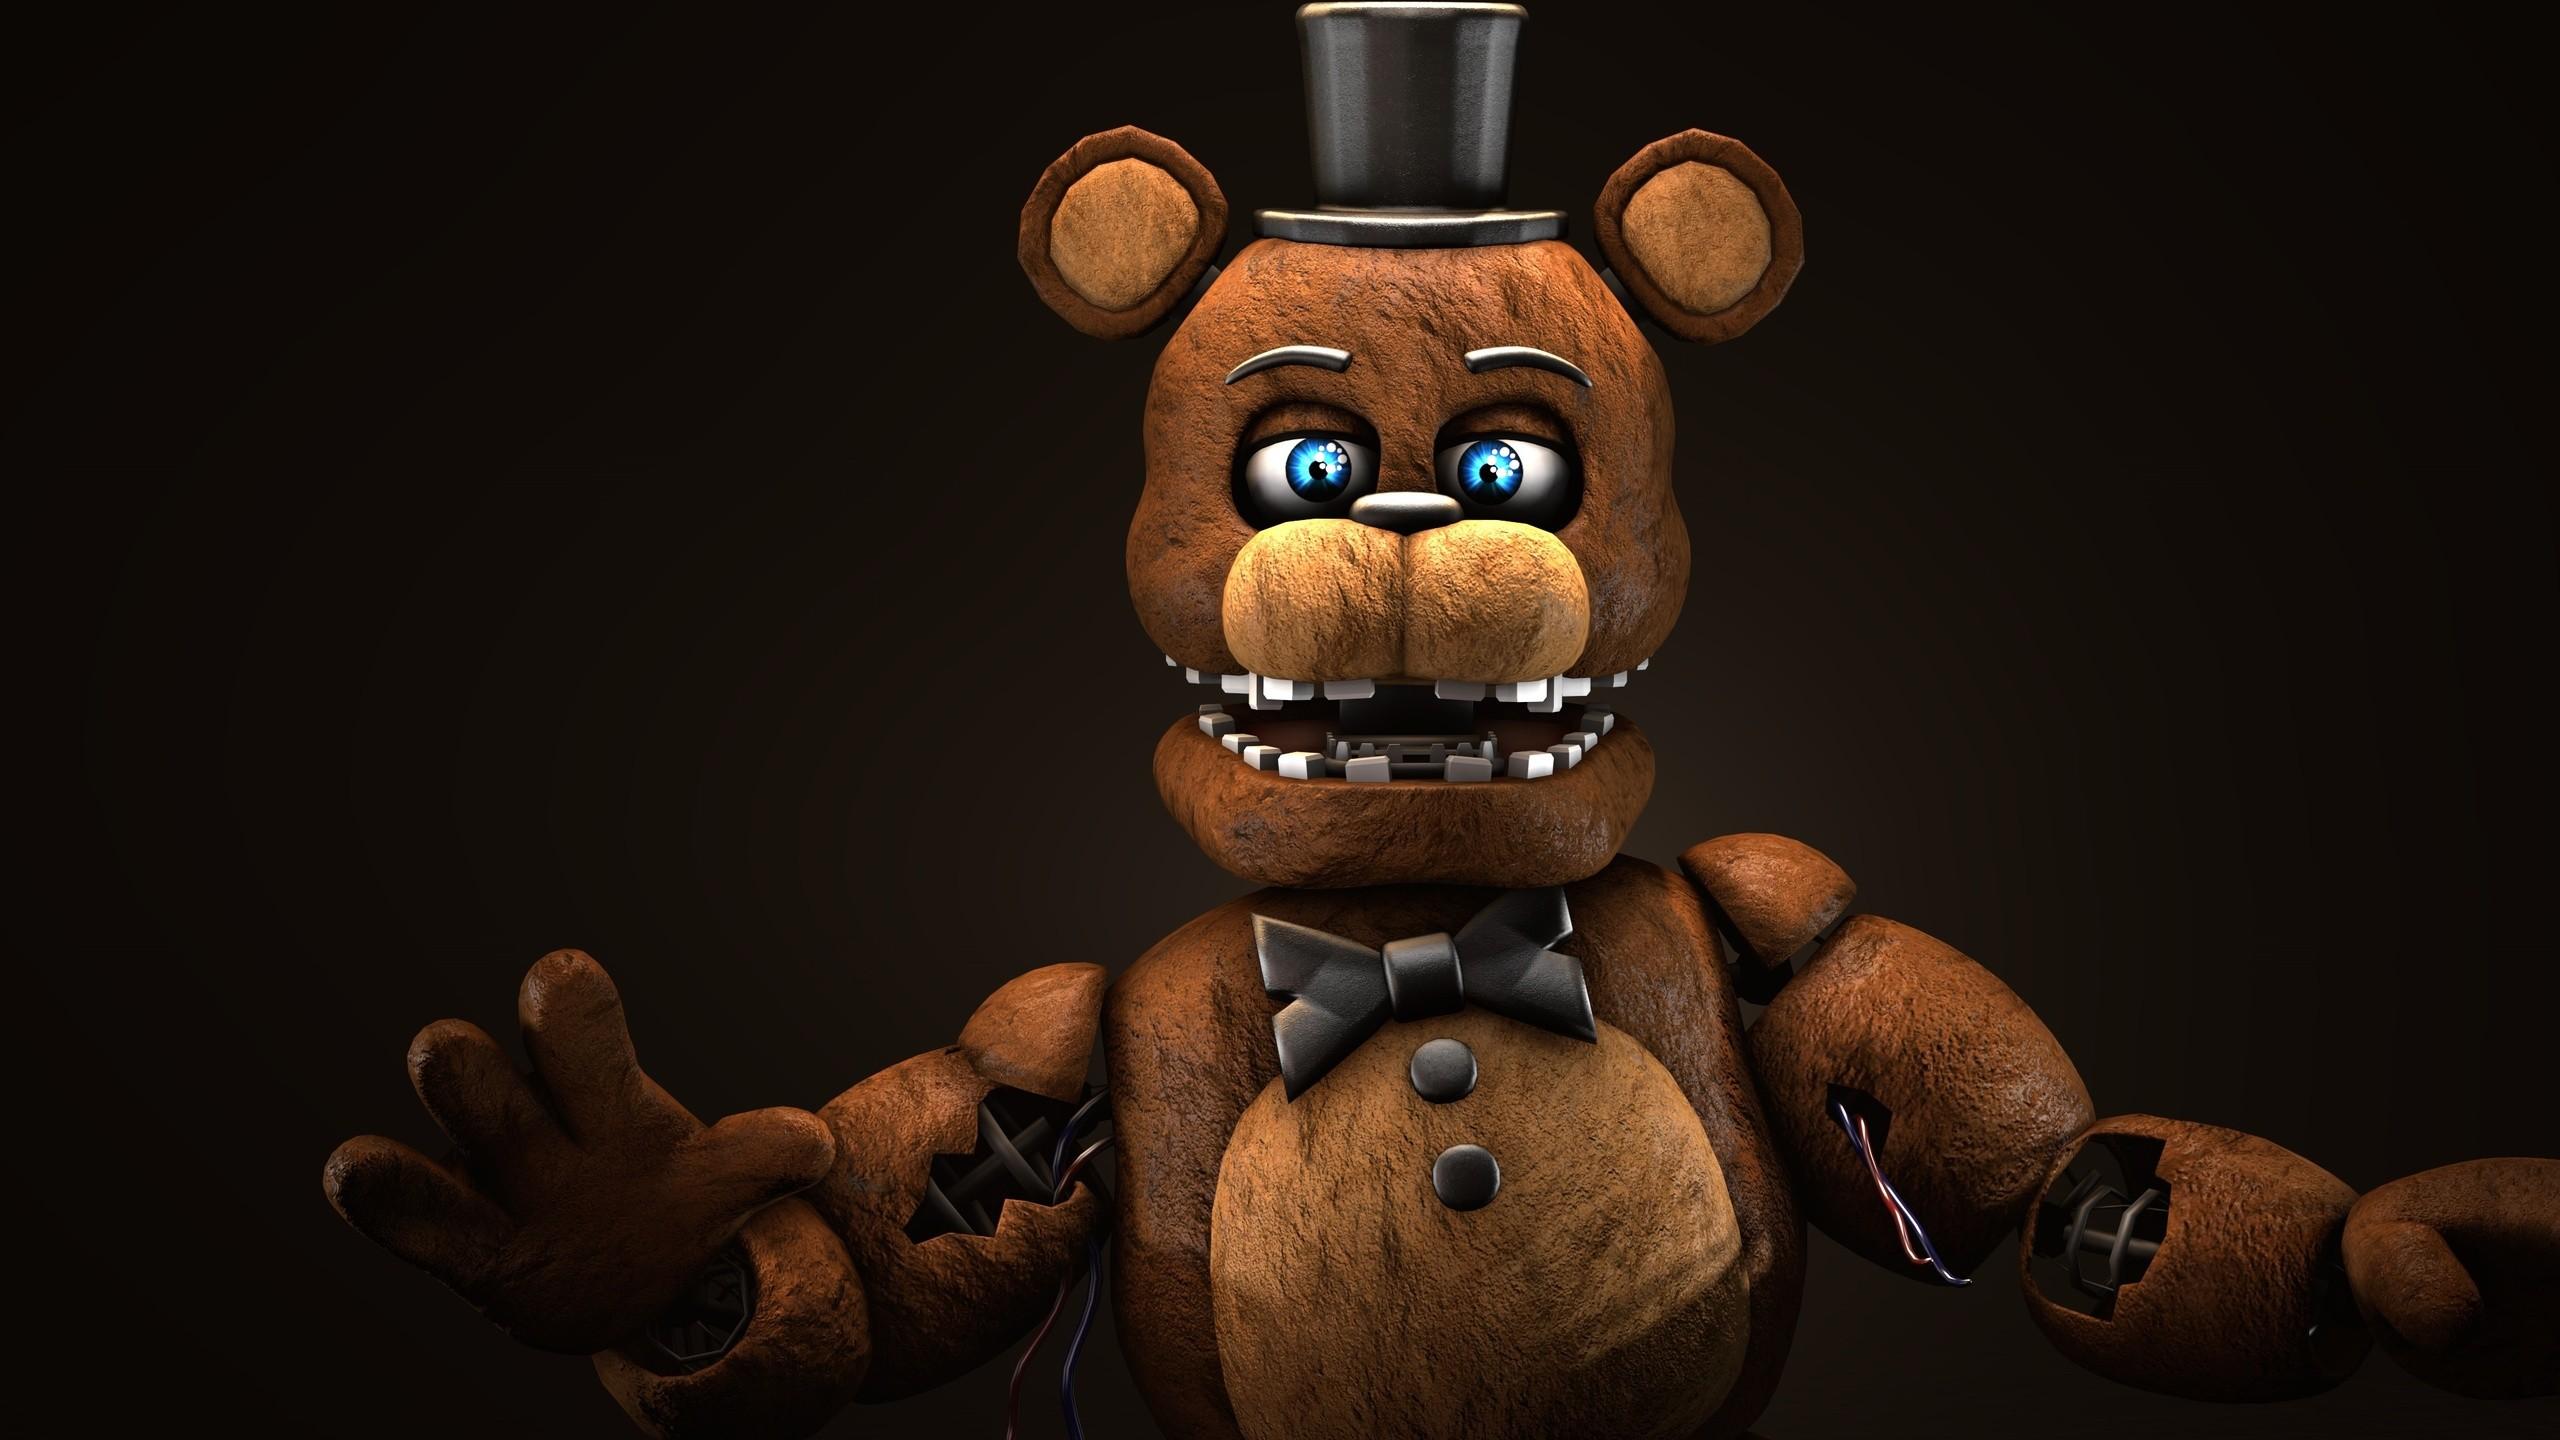 Nightmare, Fnaf, Horror Game, Freddy, Five Nights At Freddys, Five Nights